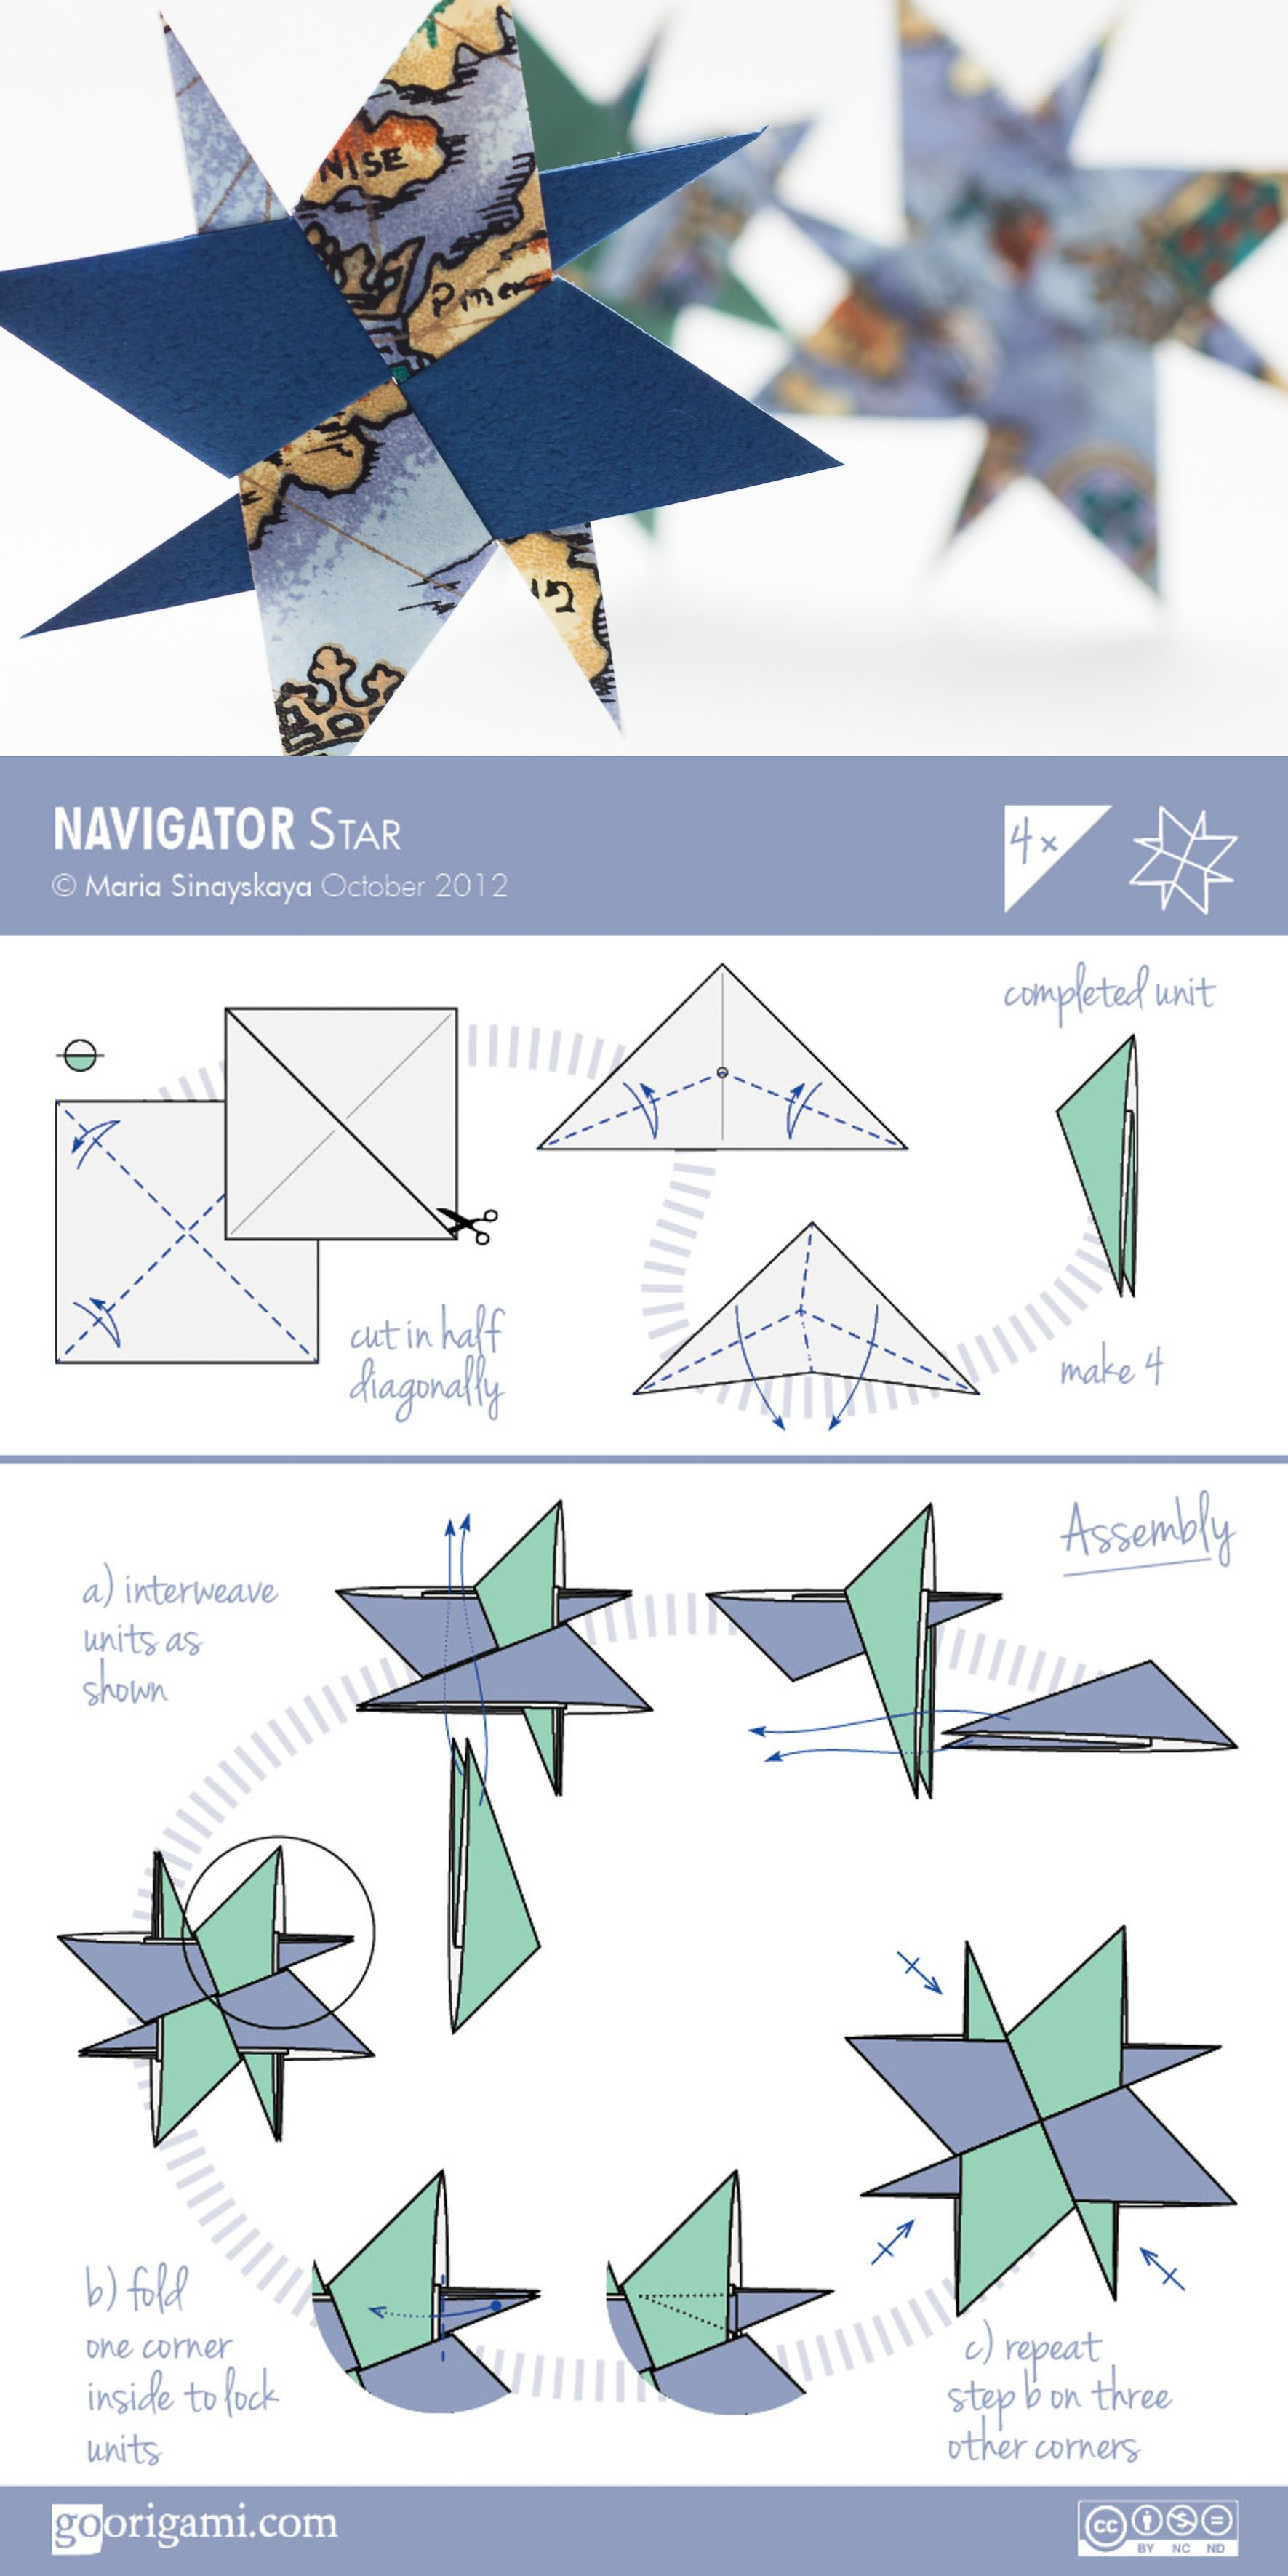 Navigator Star By Maria Sinayskaya — Diagram | Diagrammes avec Origami Rose Facile A Faire